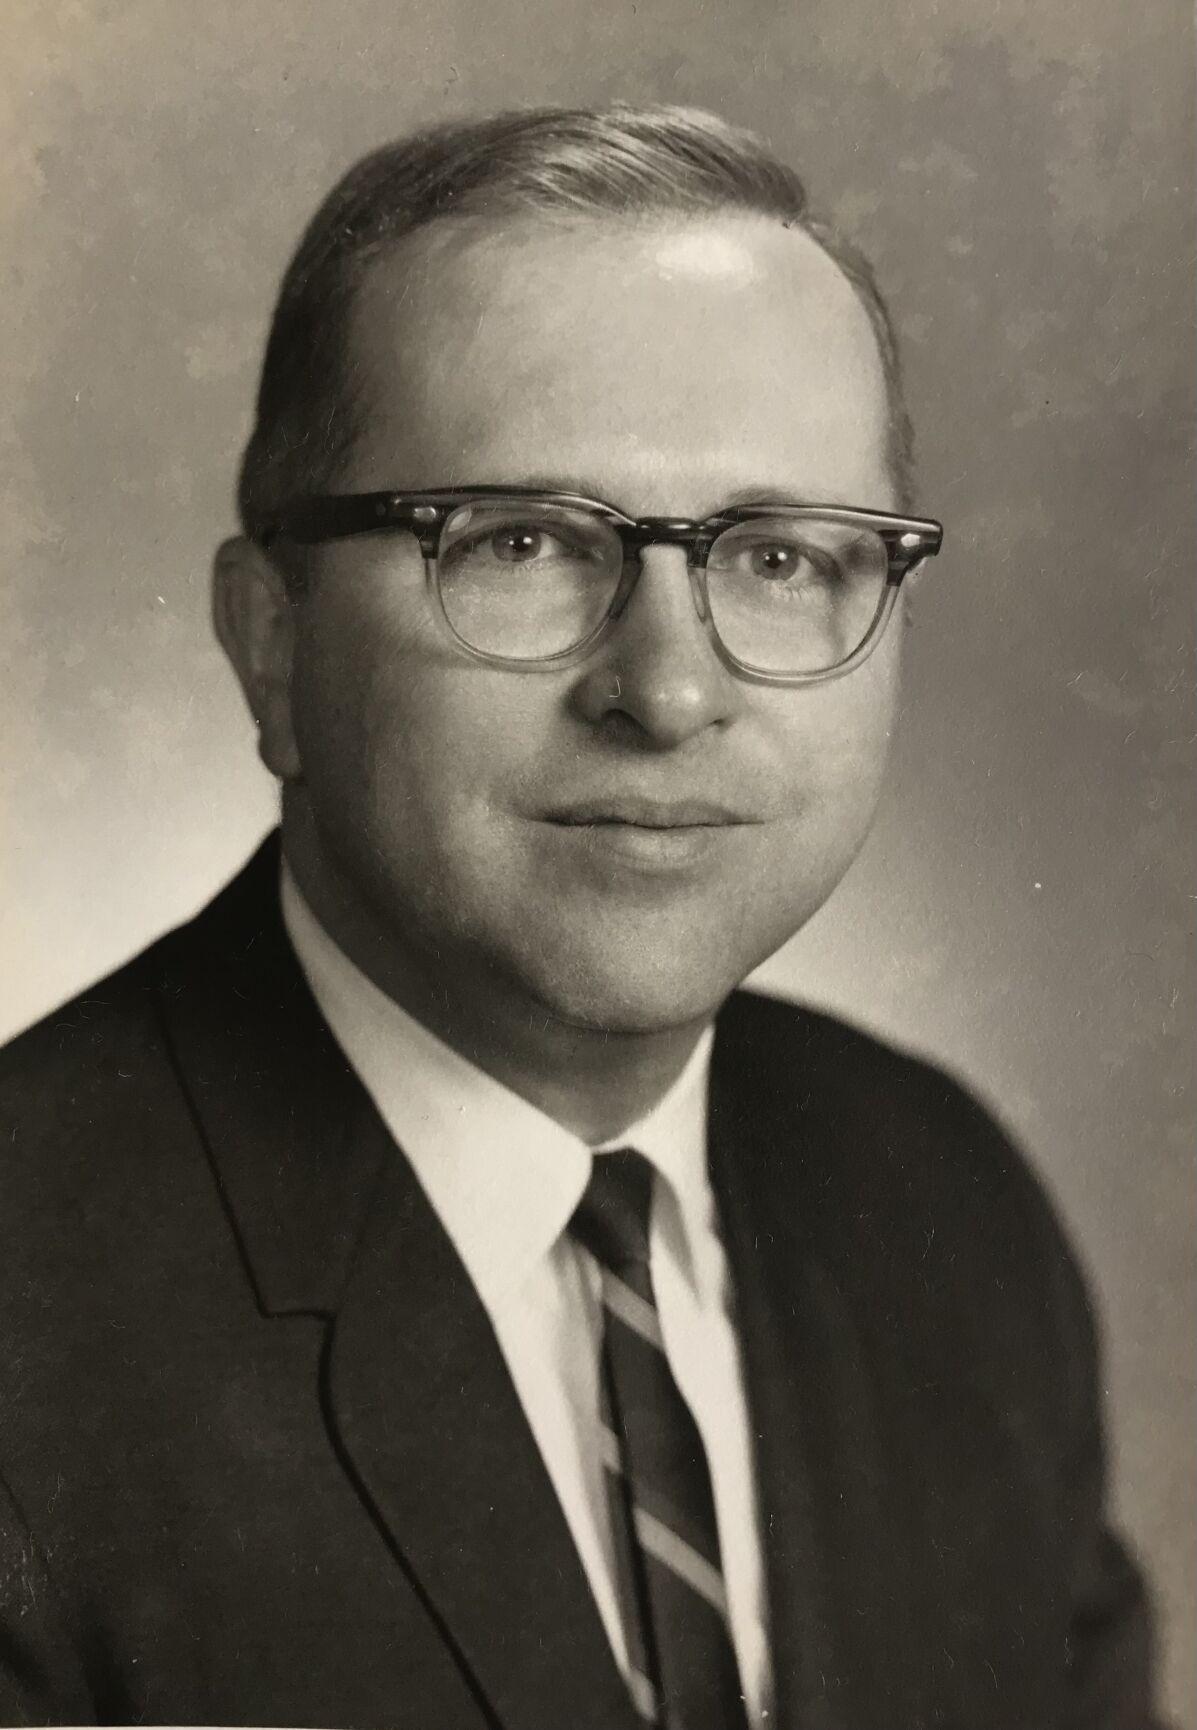 Frank Gibson Head, Jr.